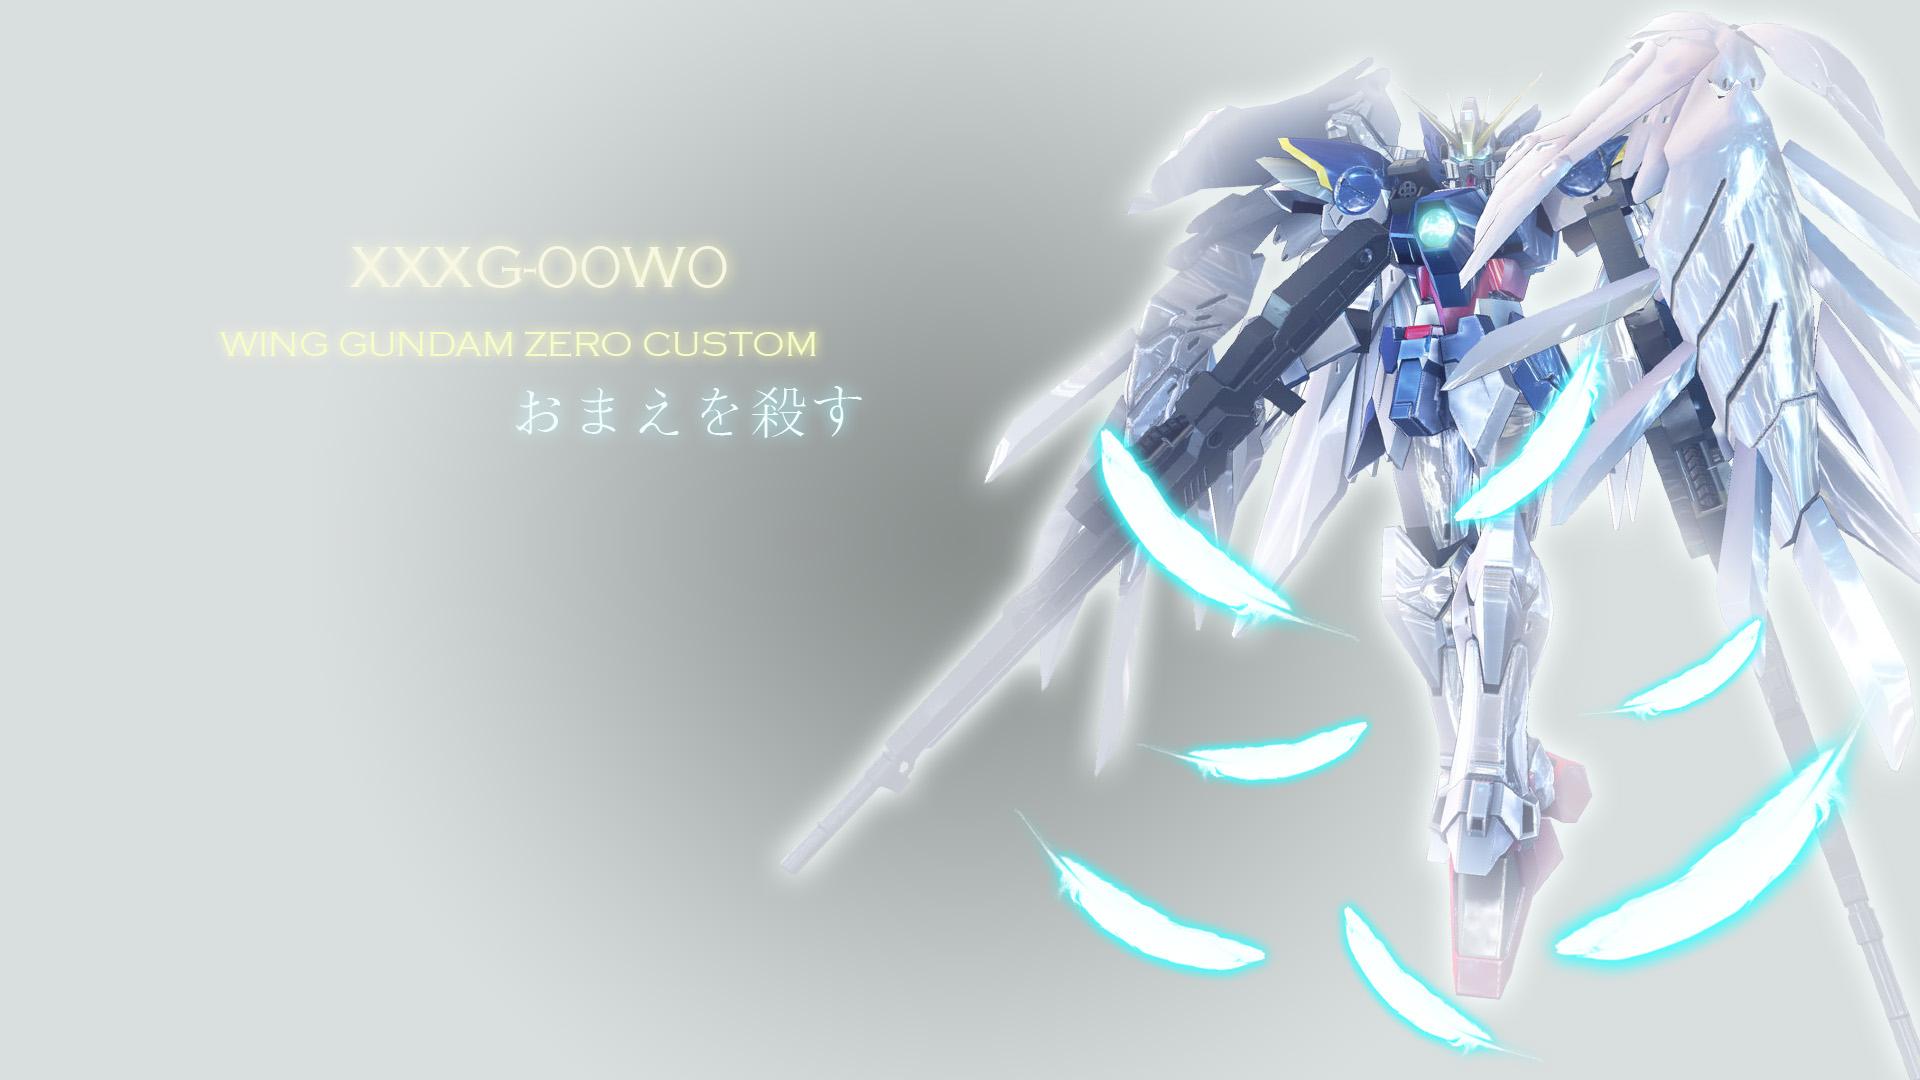 Mobile Suit Gundam Wing HD Wallpaper #1396195 - Zerochan